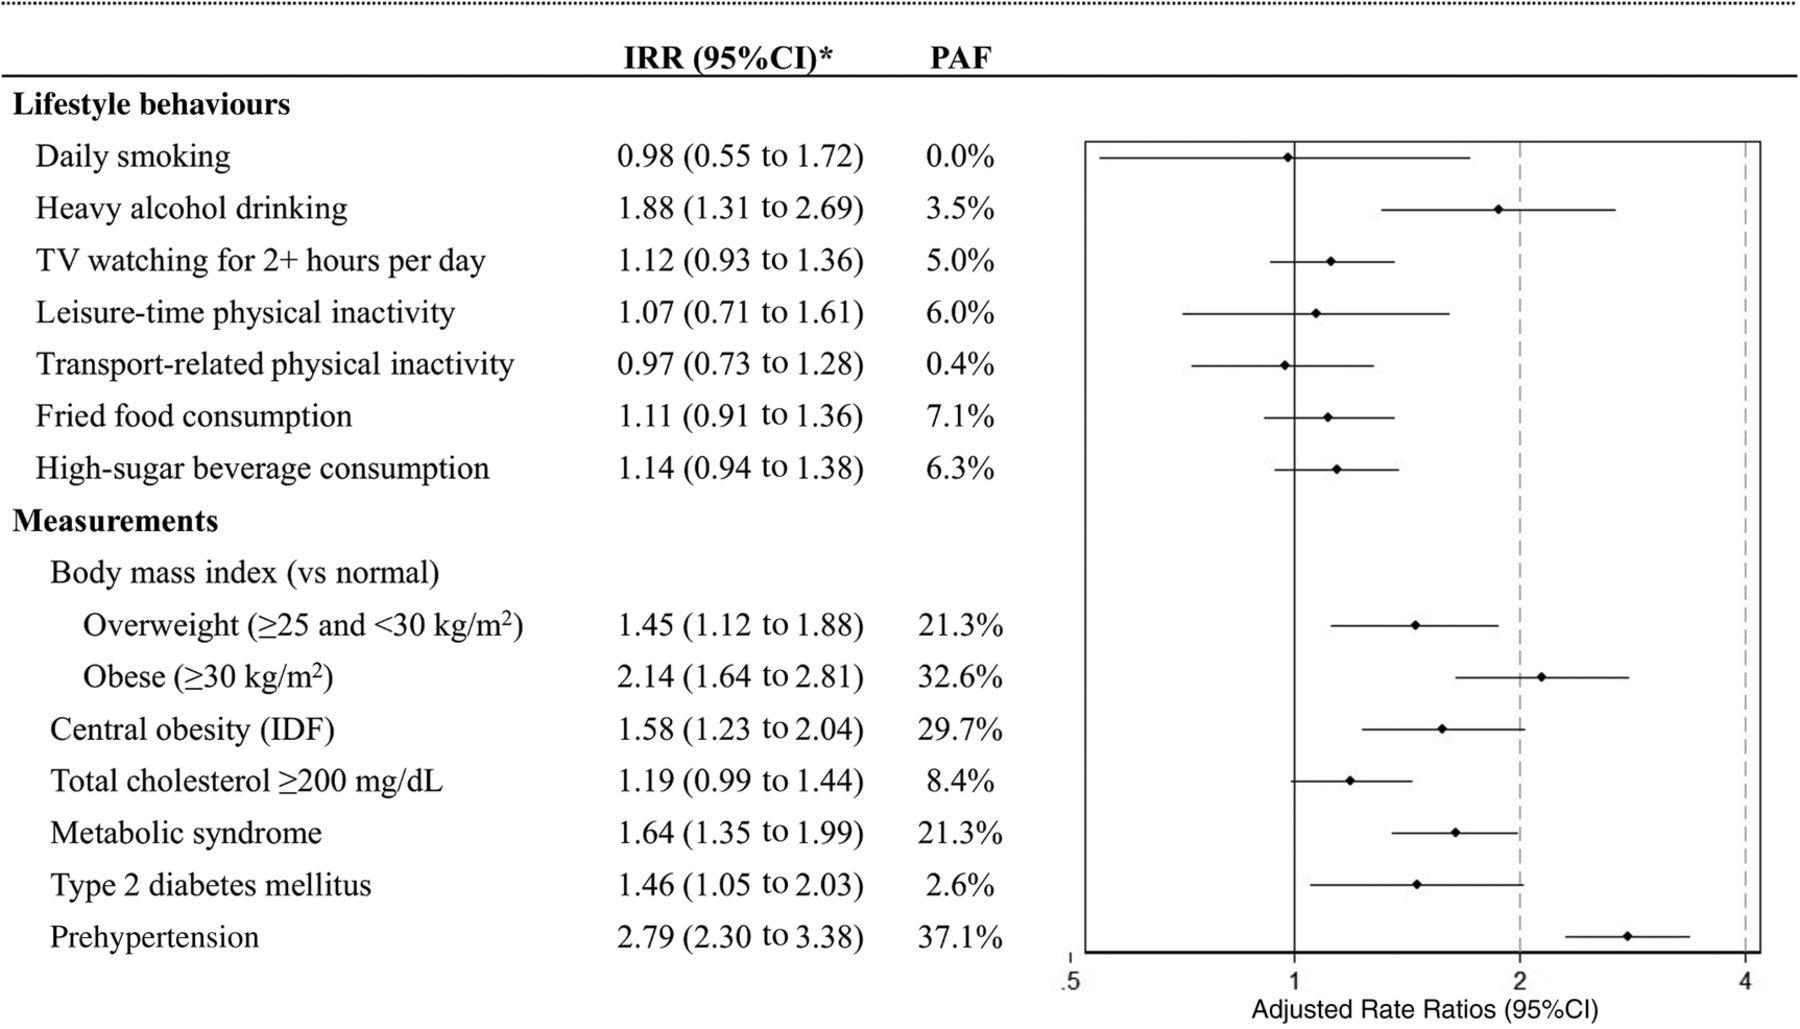 IRR hypertensive type, symptoms and treatment 17